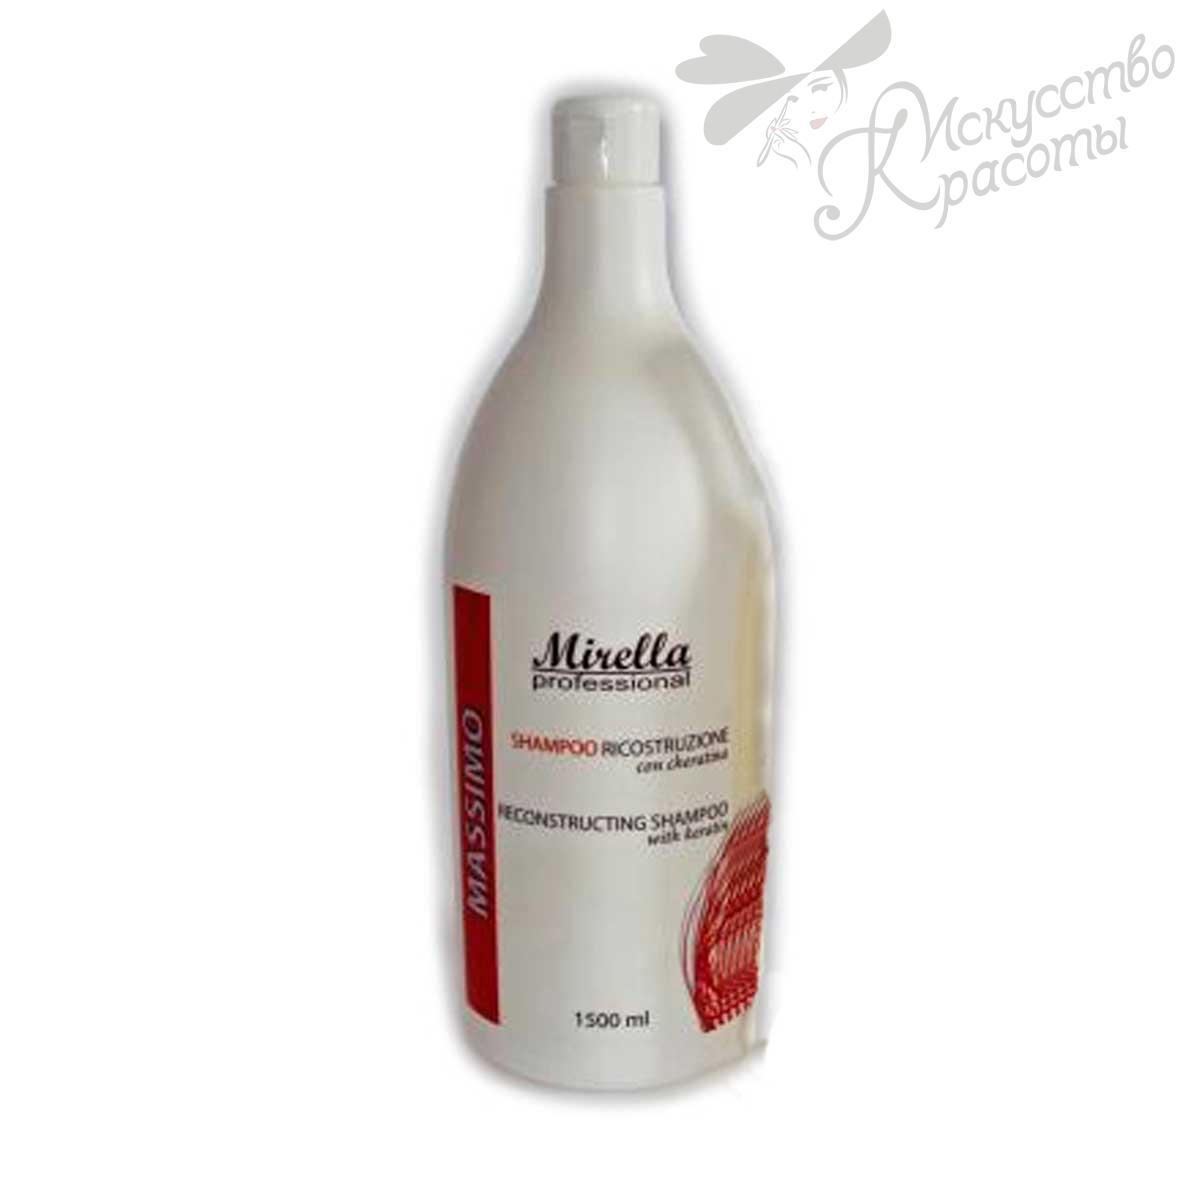 Mirella Восстанавливающий шампунь с кератином, 1500мл